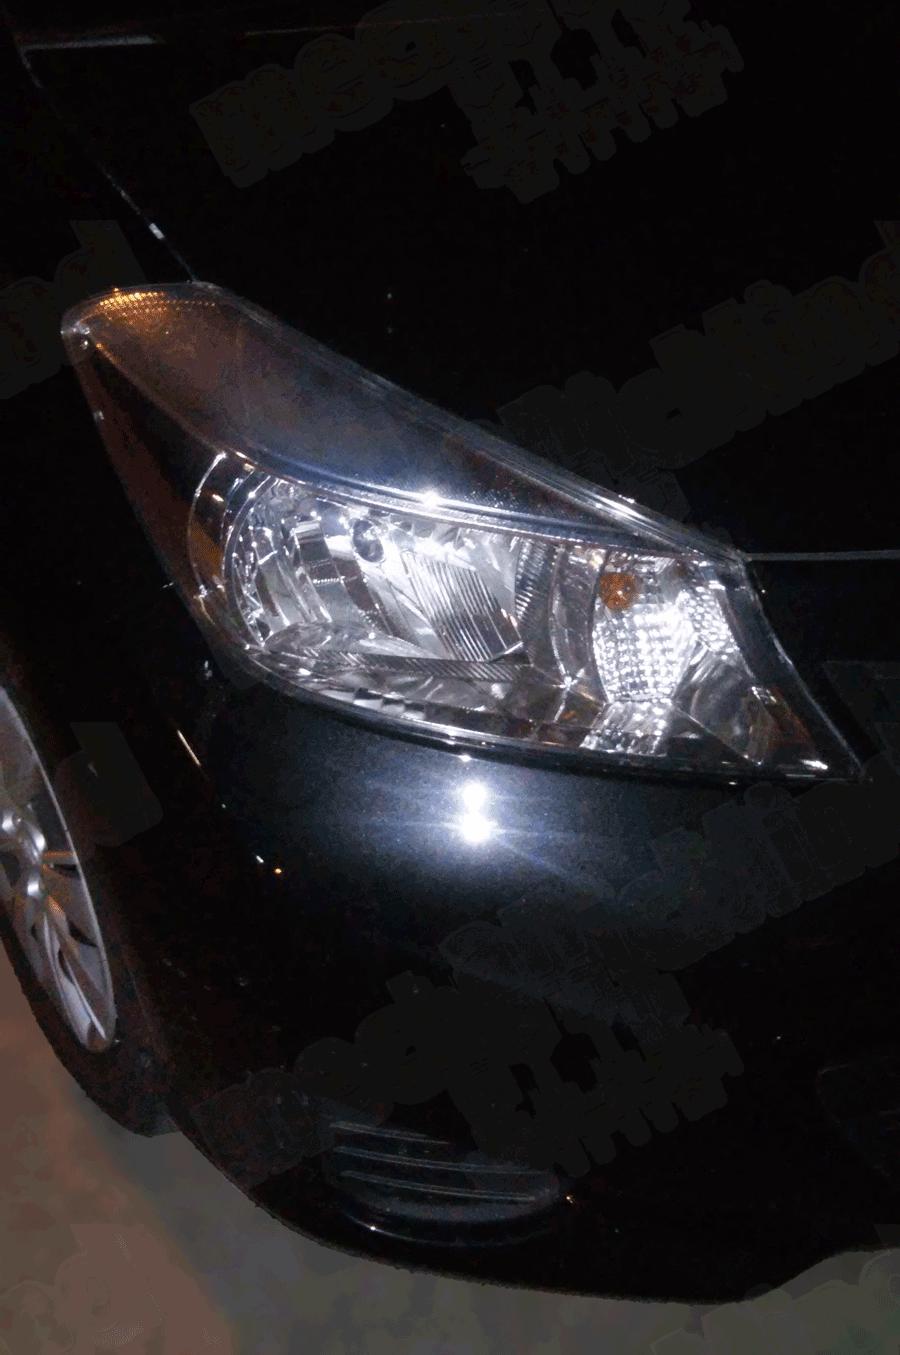 Toyota Yaris Serie 3 Sostituzione Lampadina Faro ...